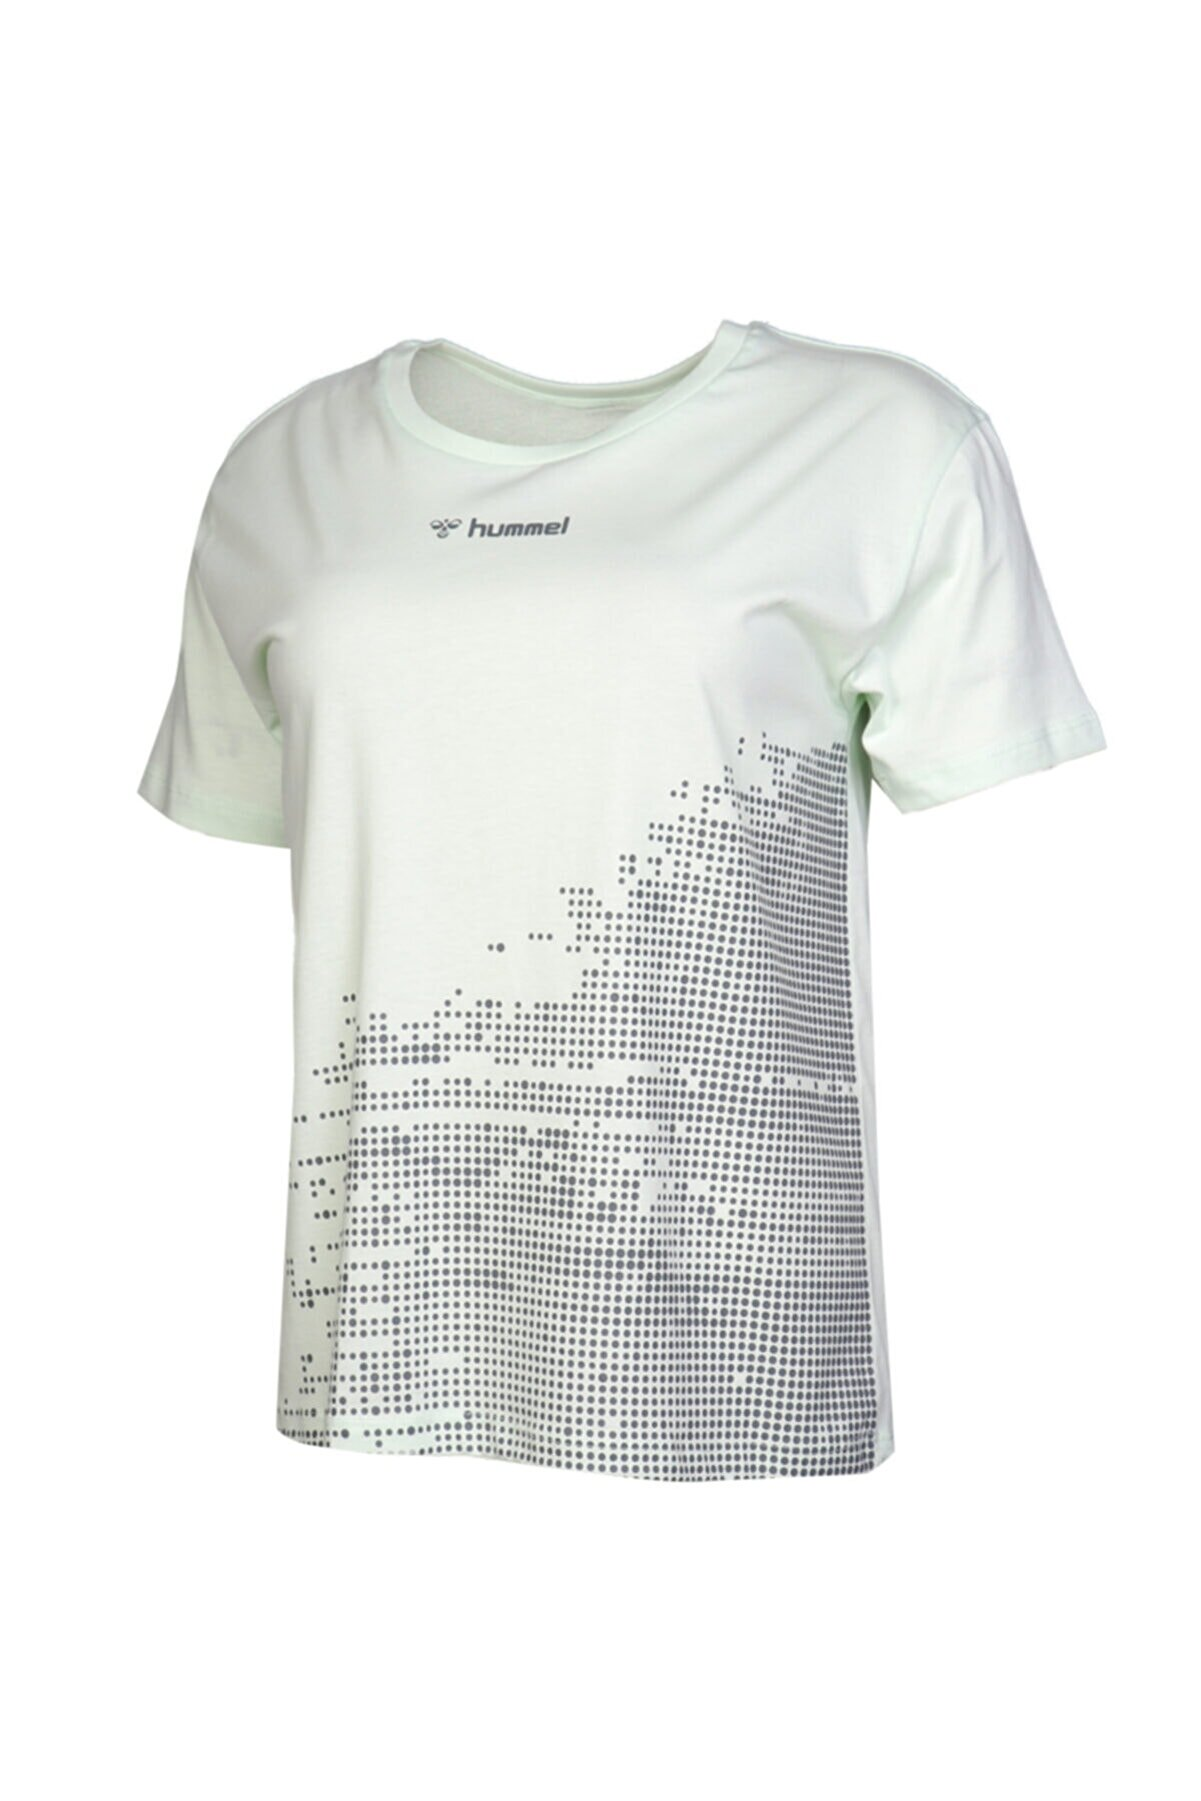 HUMMEL Mırıam Kısa Kollu Tişört